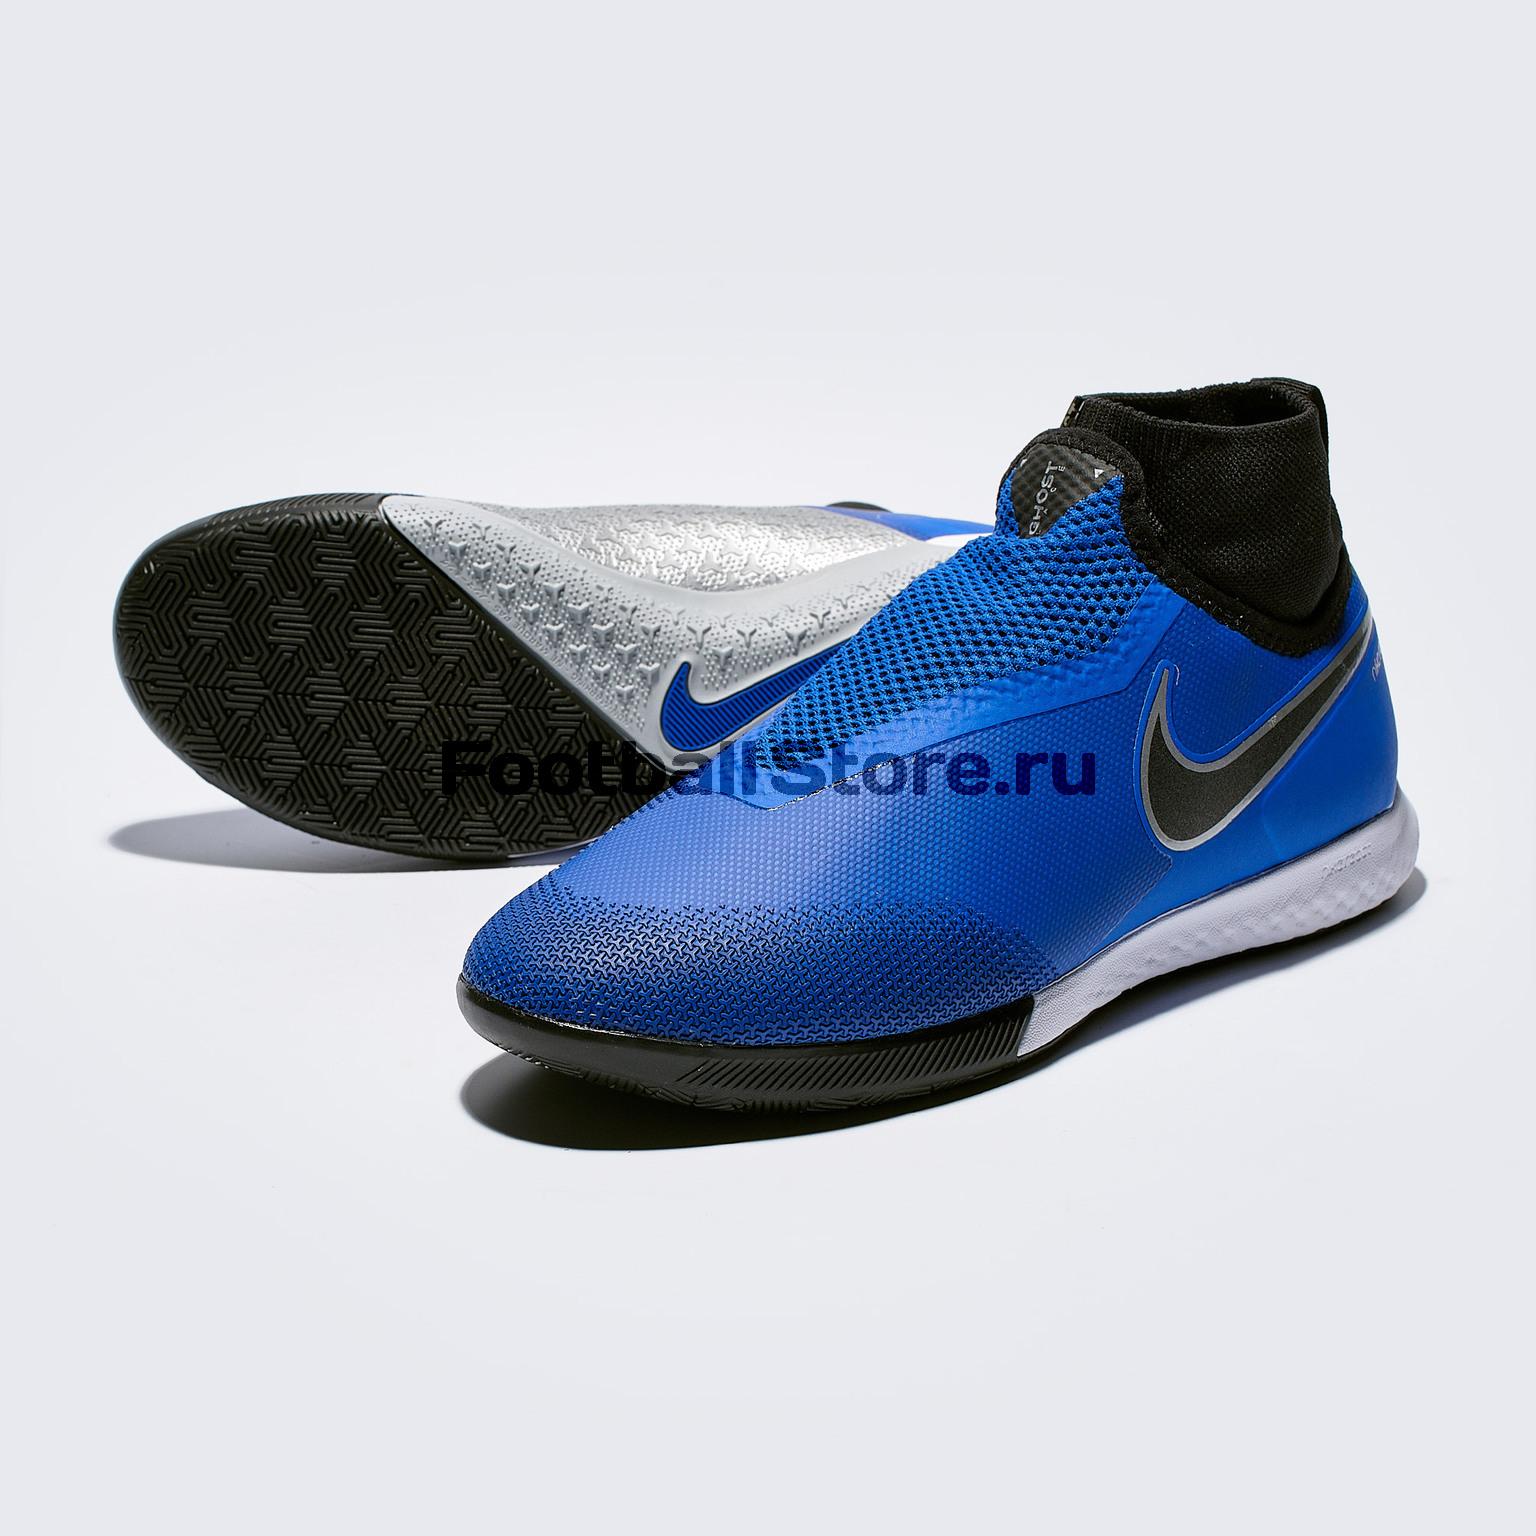 Футзалки Nike React Phantom Vision Pro DF IC AO3276-400 клюшка для гольфа nike vapor pro 2015